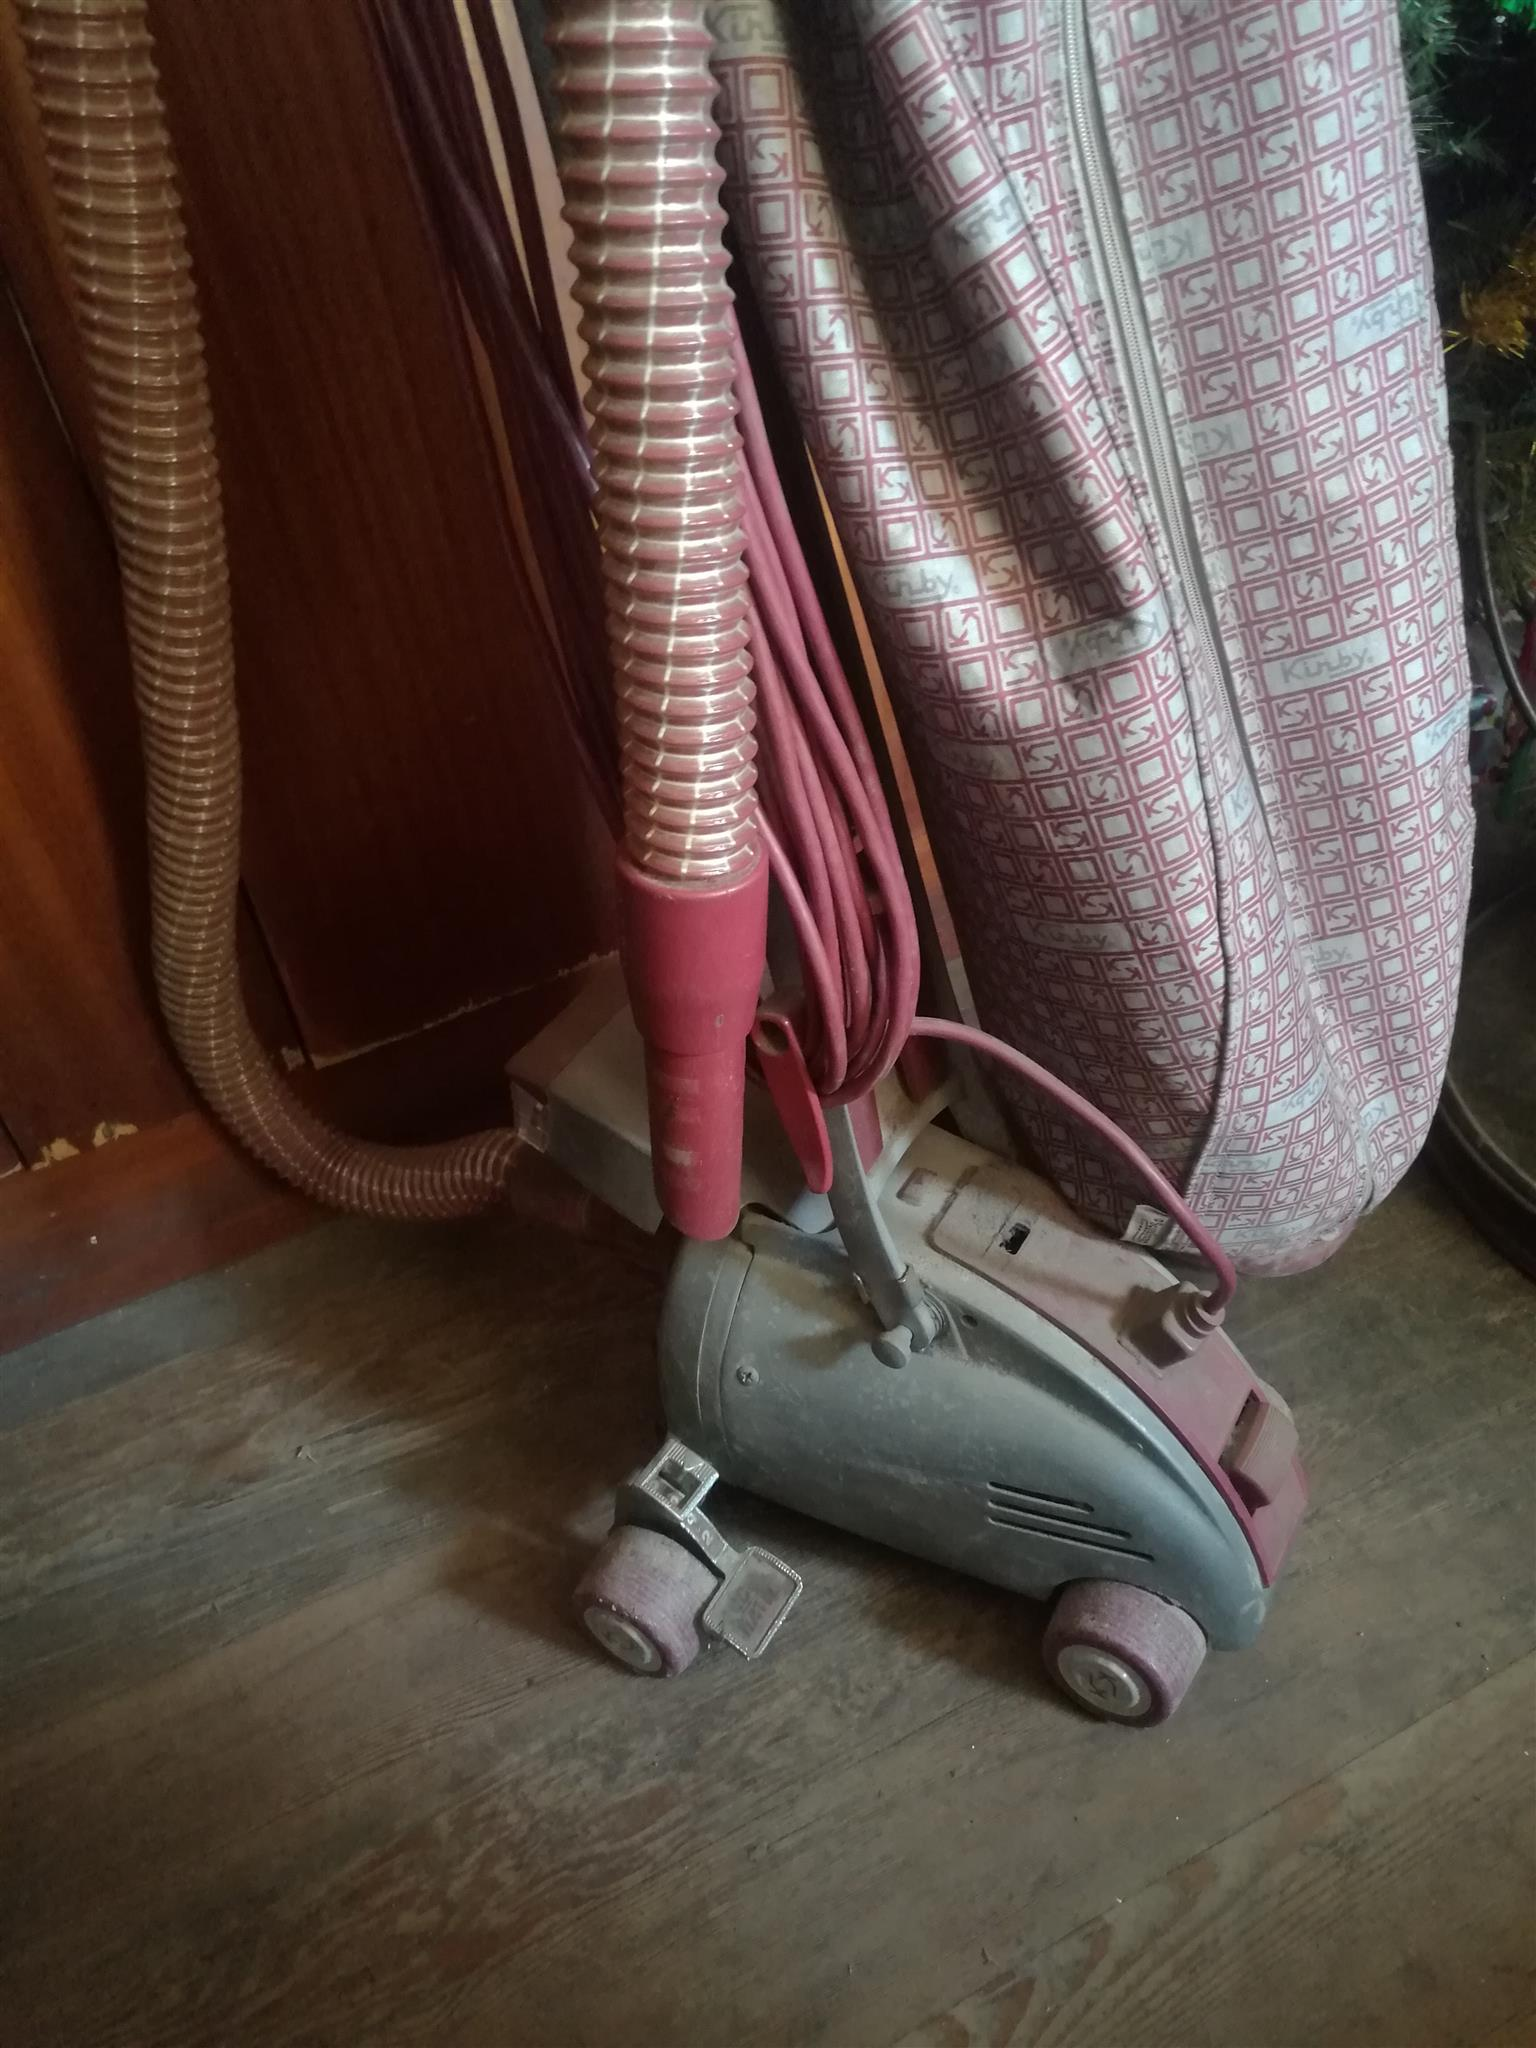 Kirby Legend vacuum